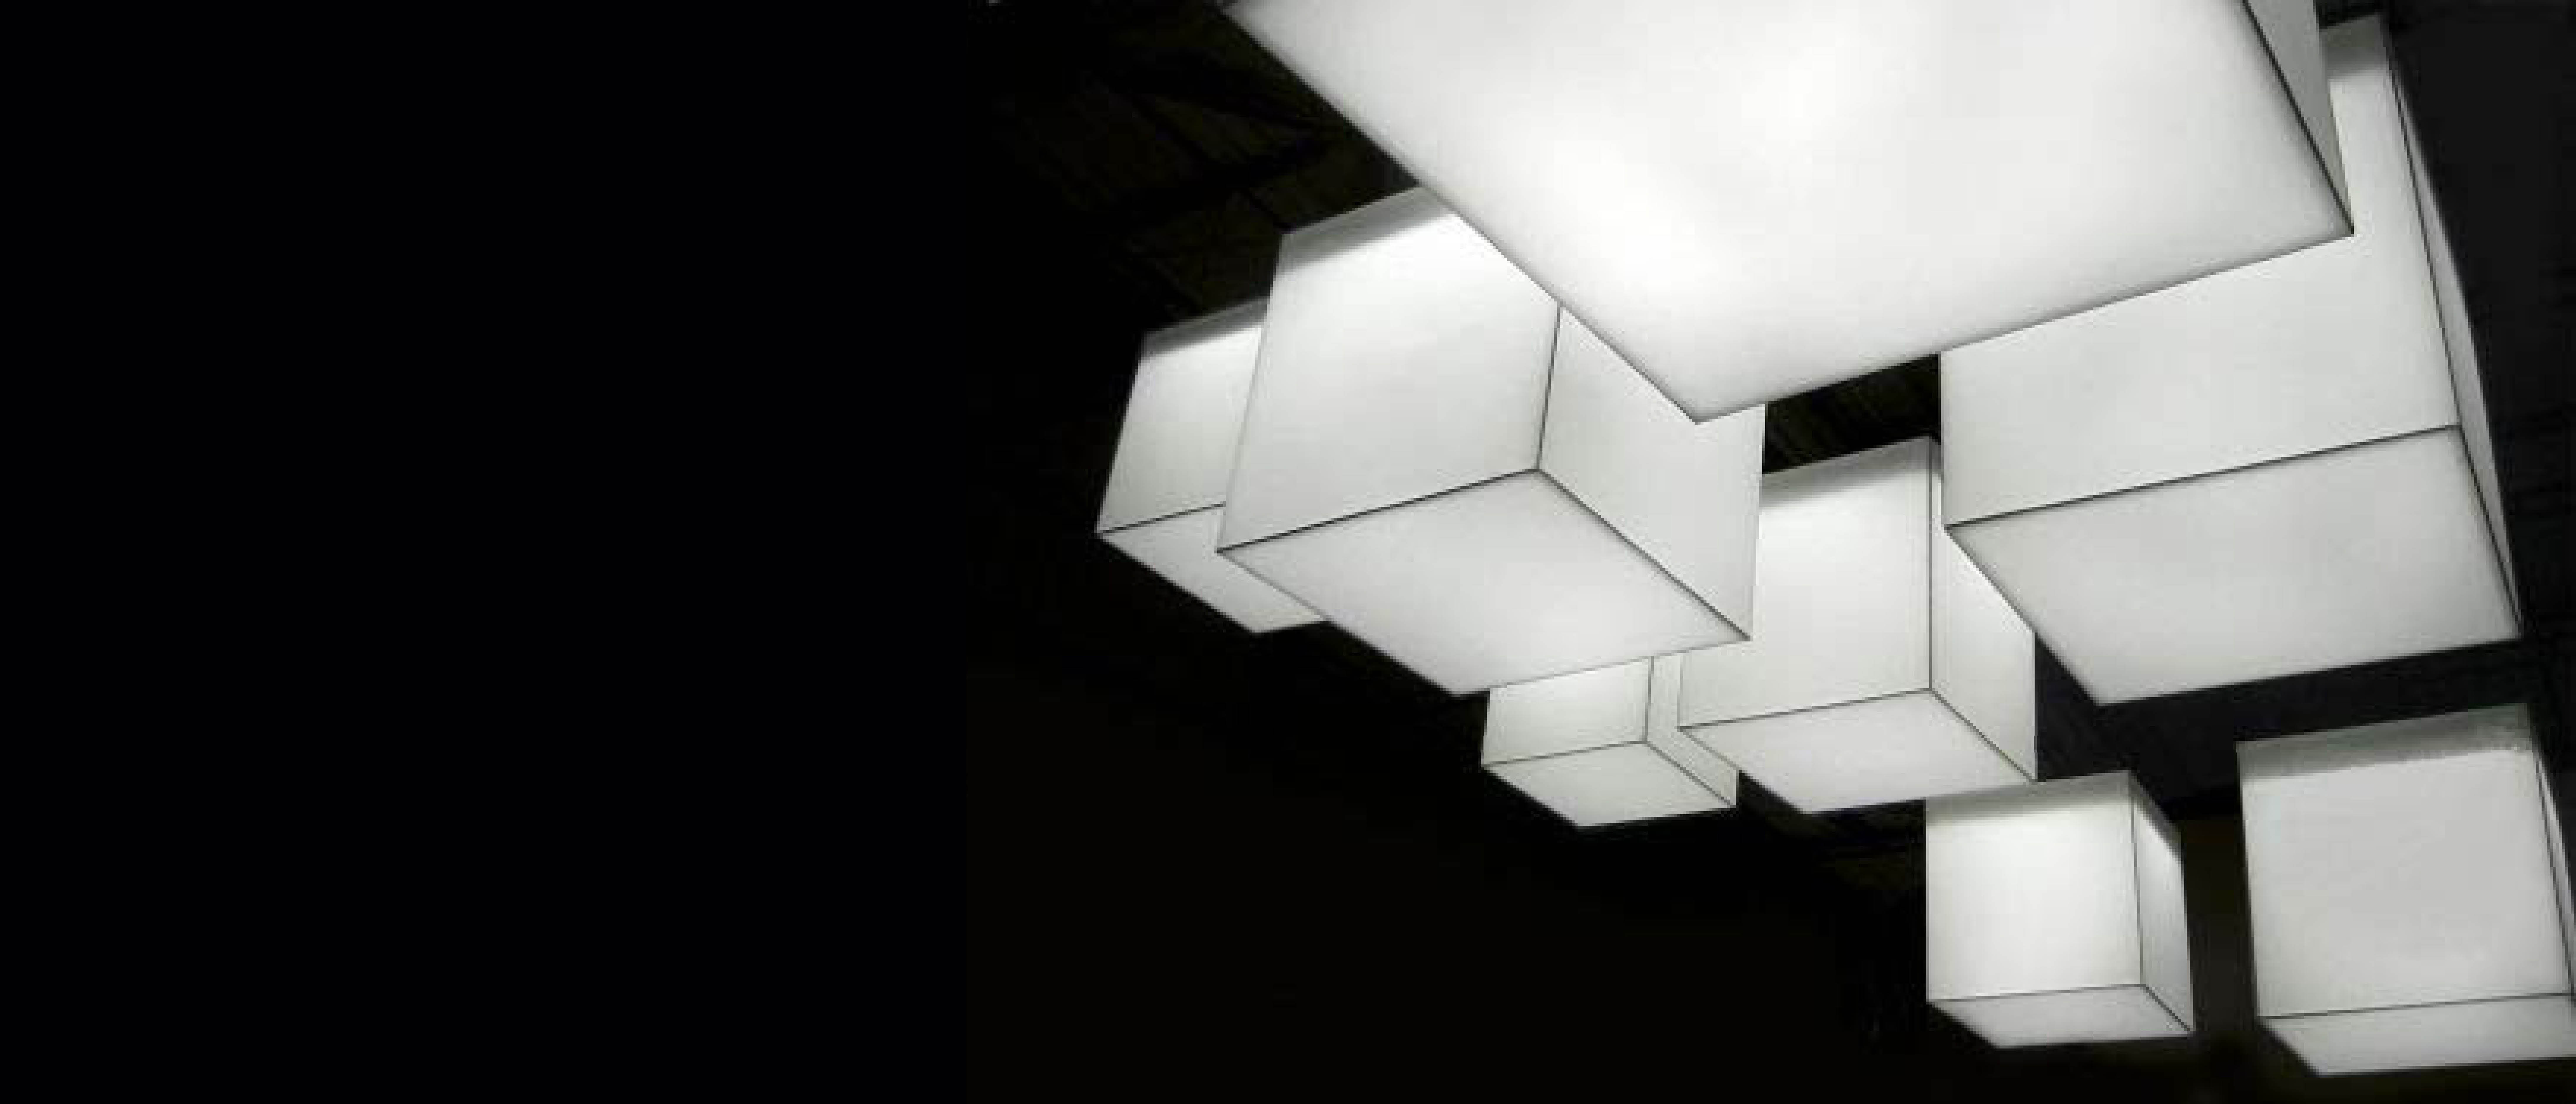 Exhibition Cube